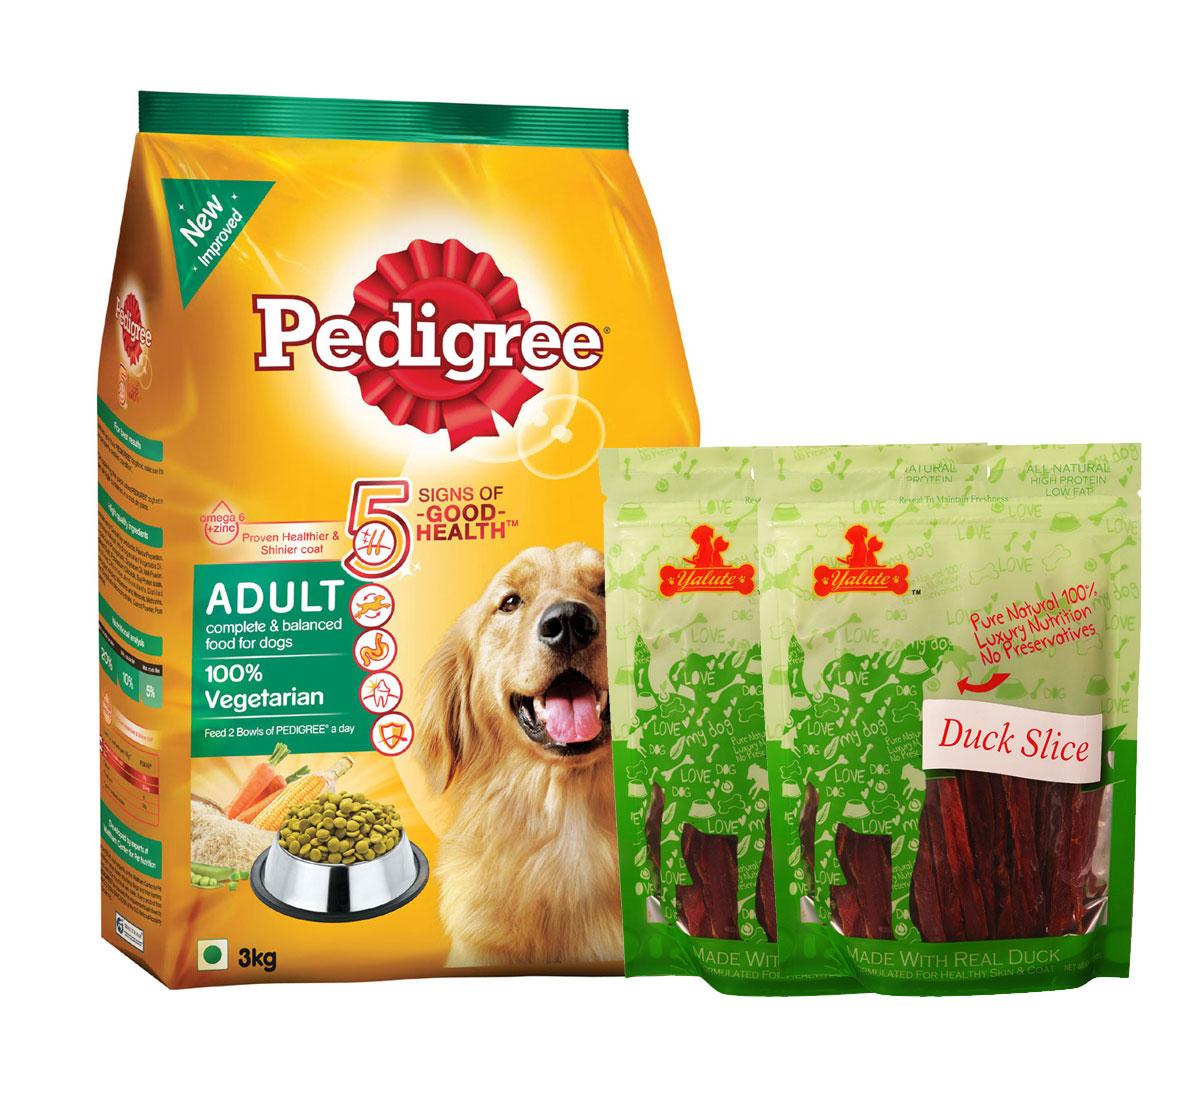 Pedigree Dog Food Adult 100% Vegetarian - 3 Kg  With Duck Slices